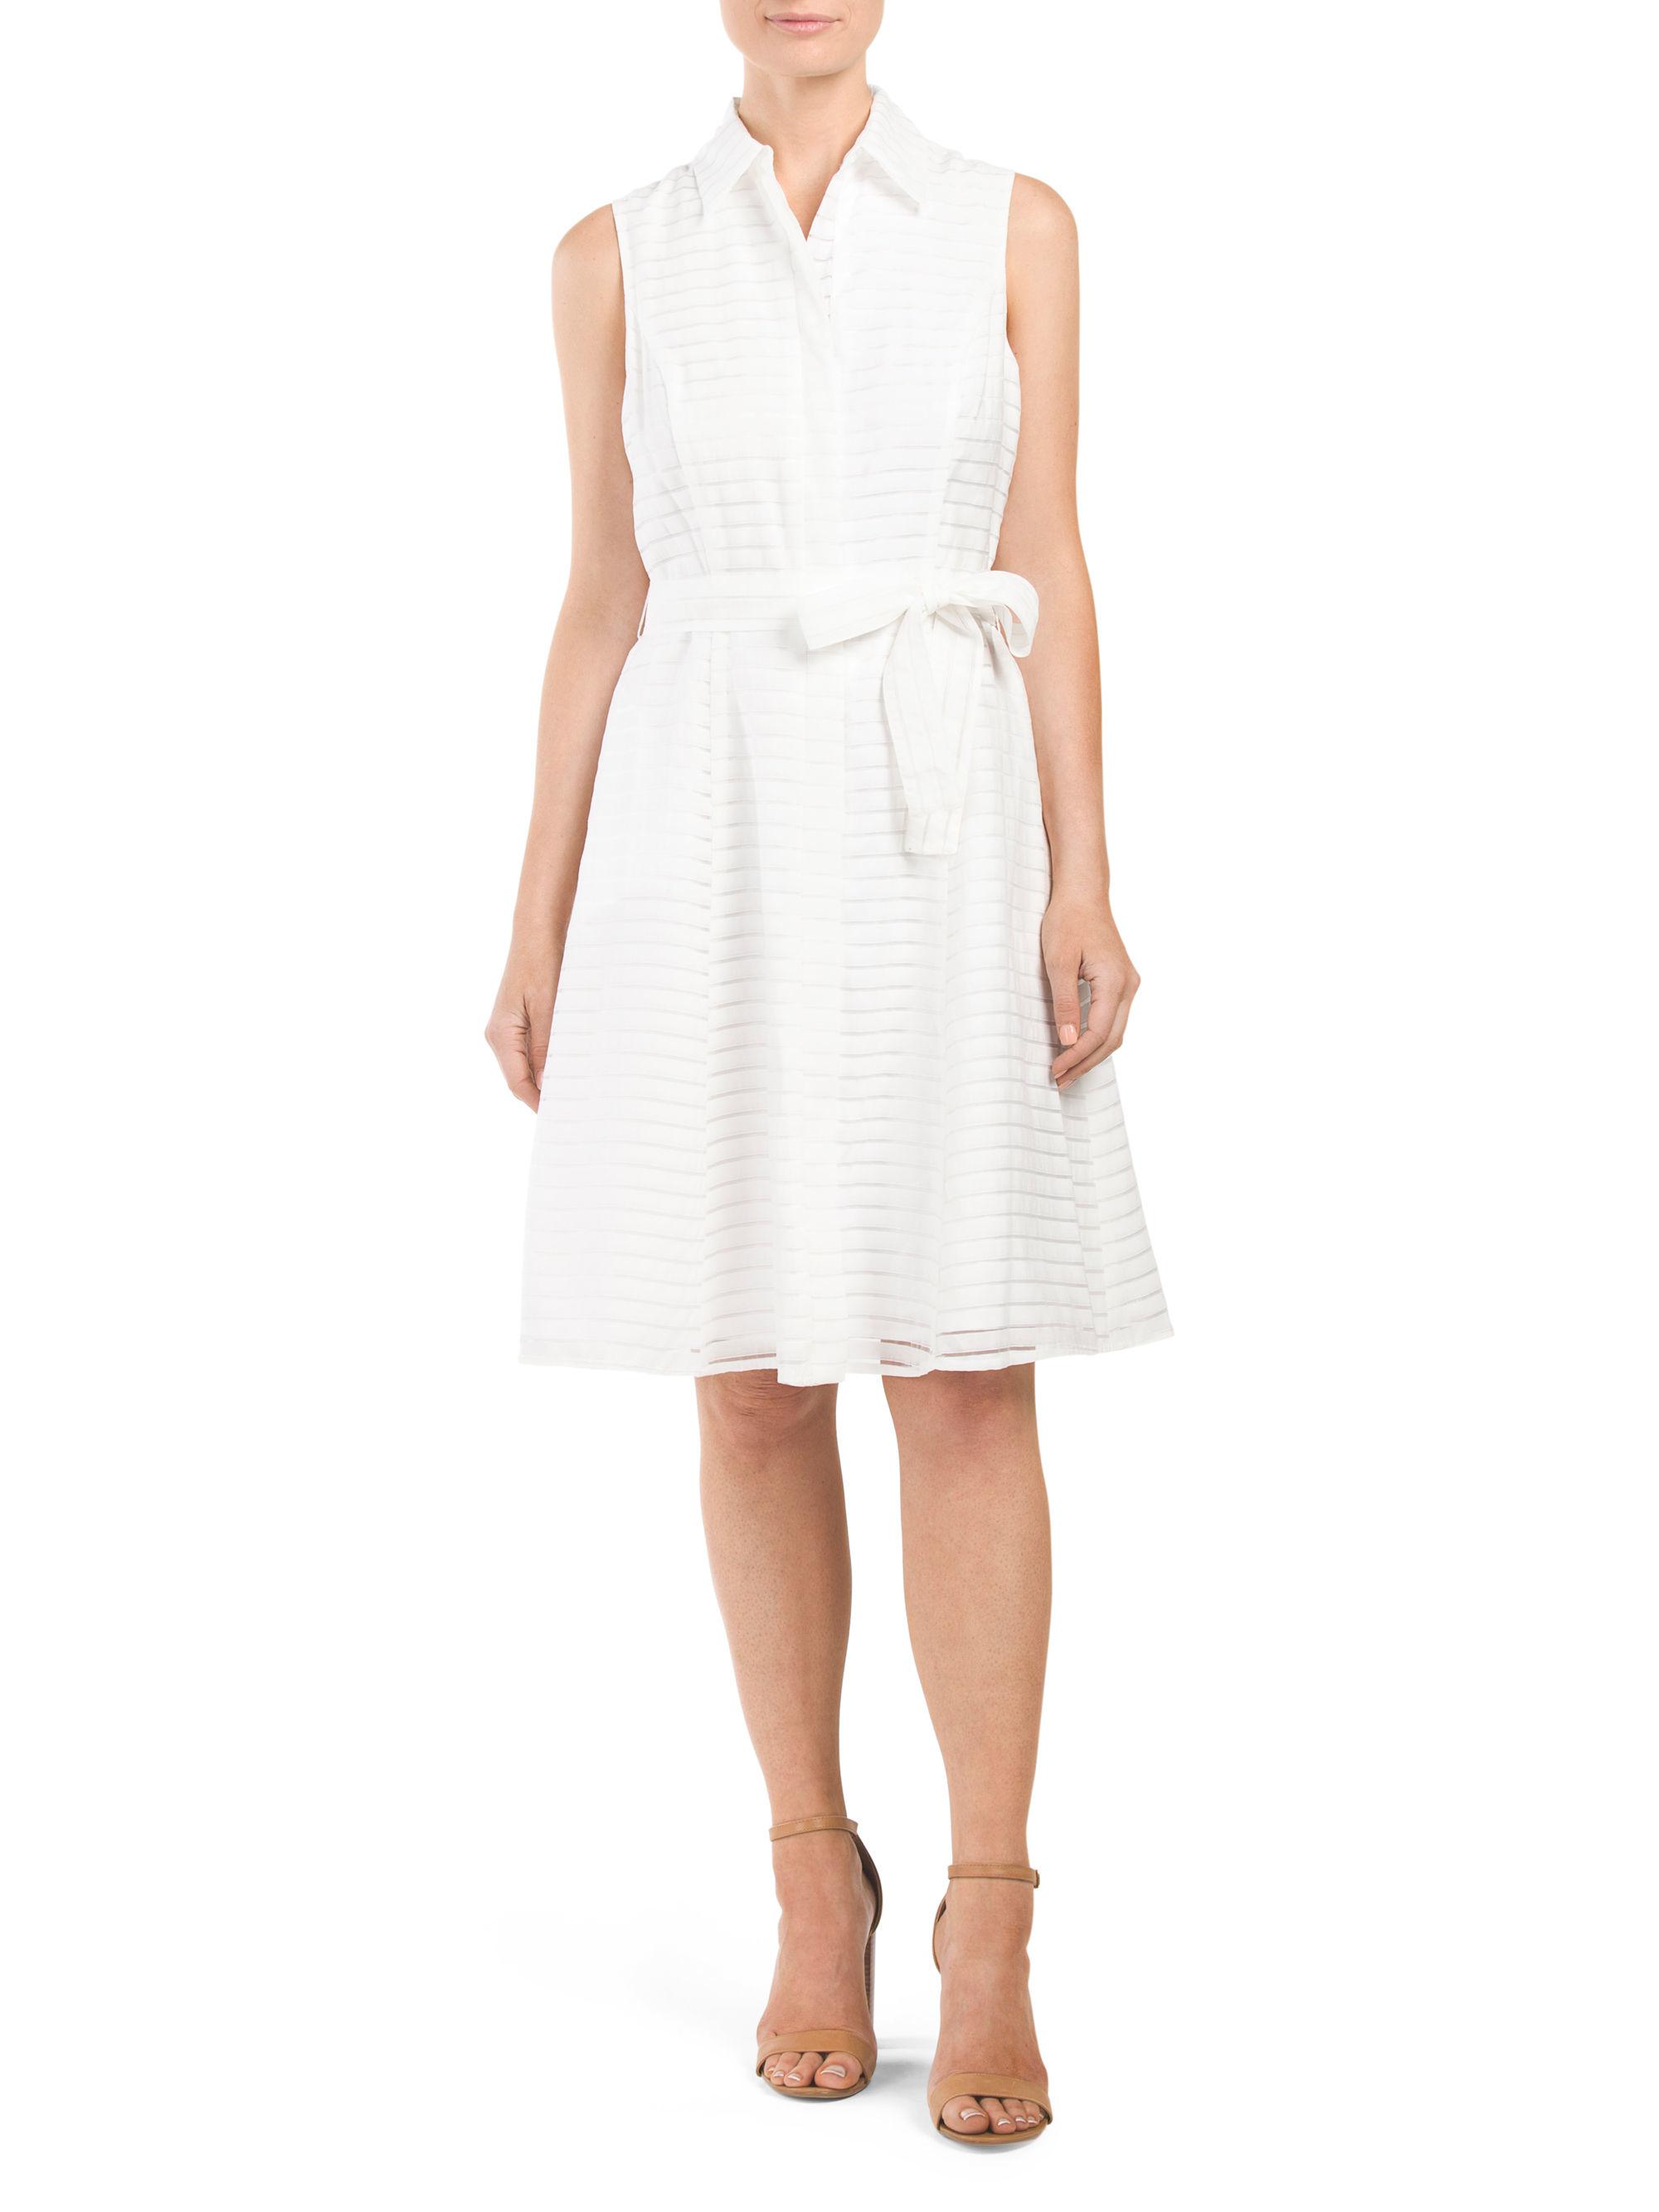 Tj maxx sleeveless illusion shirt dress in white lyst for Tj maxx t shirts